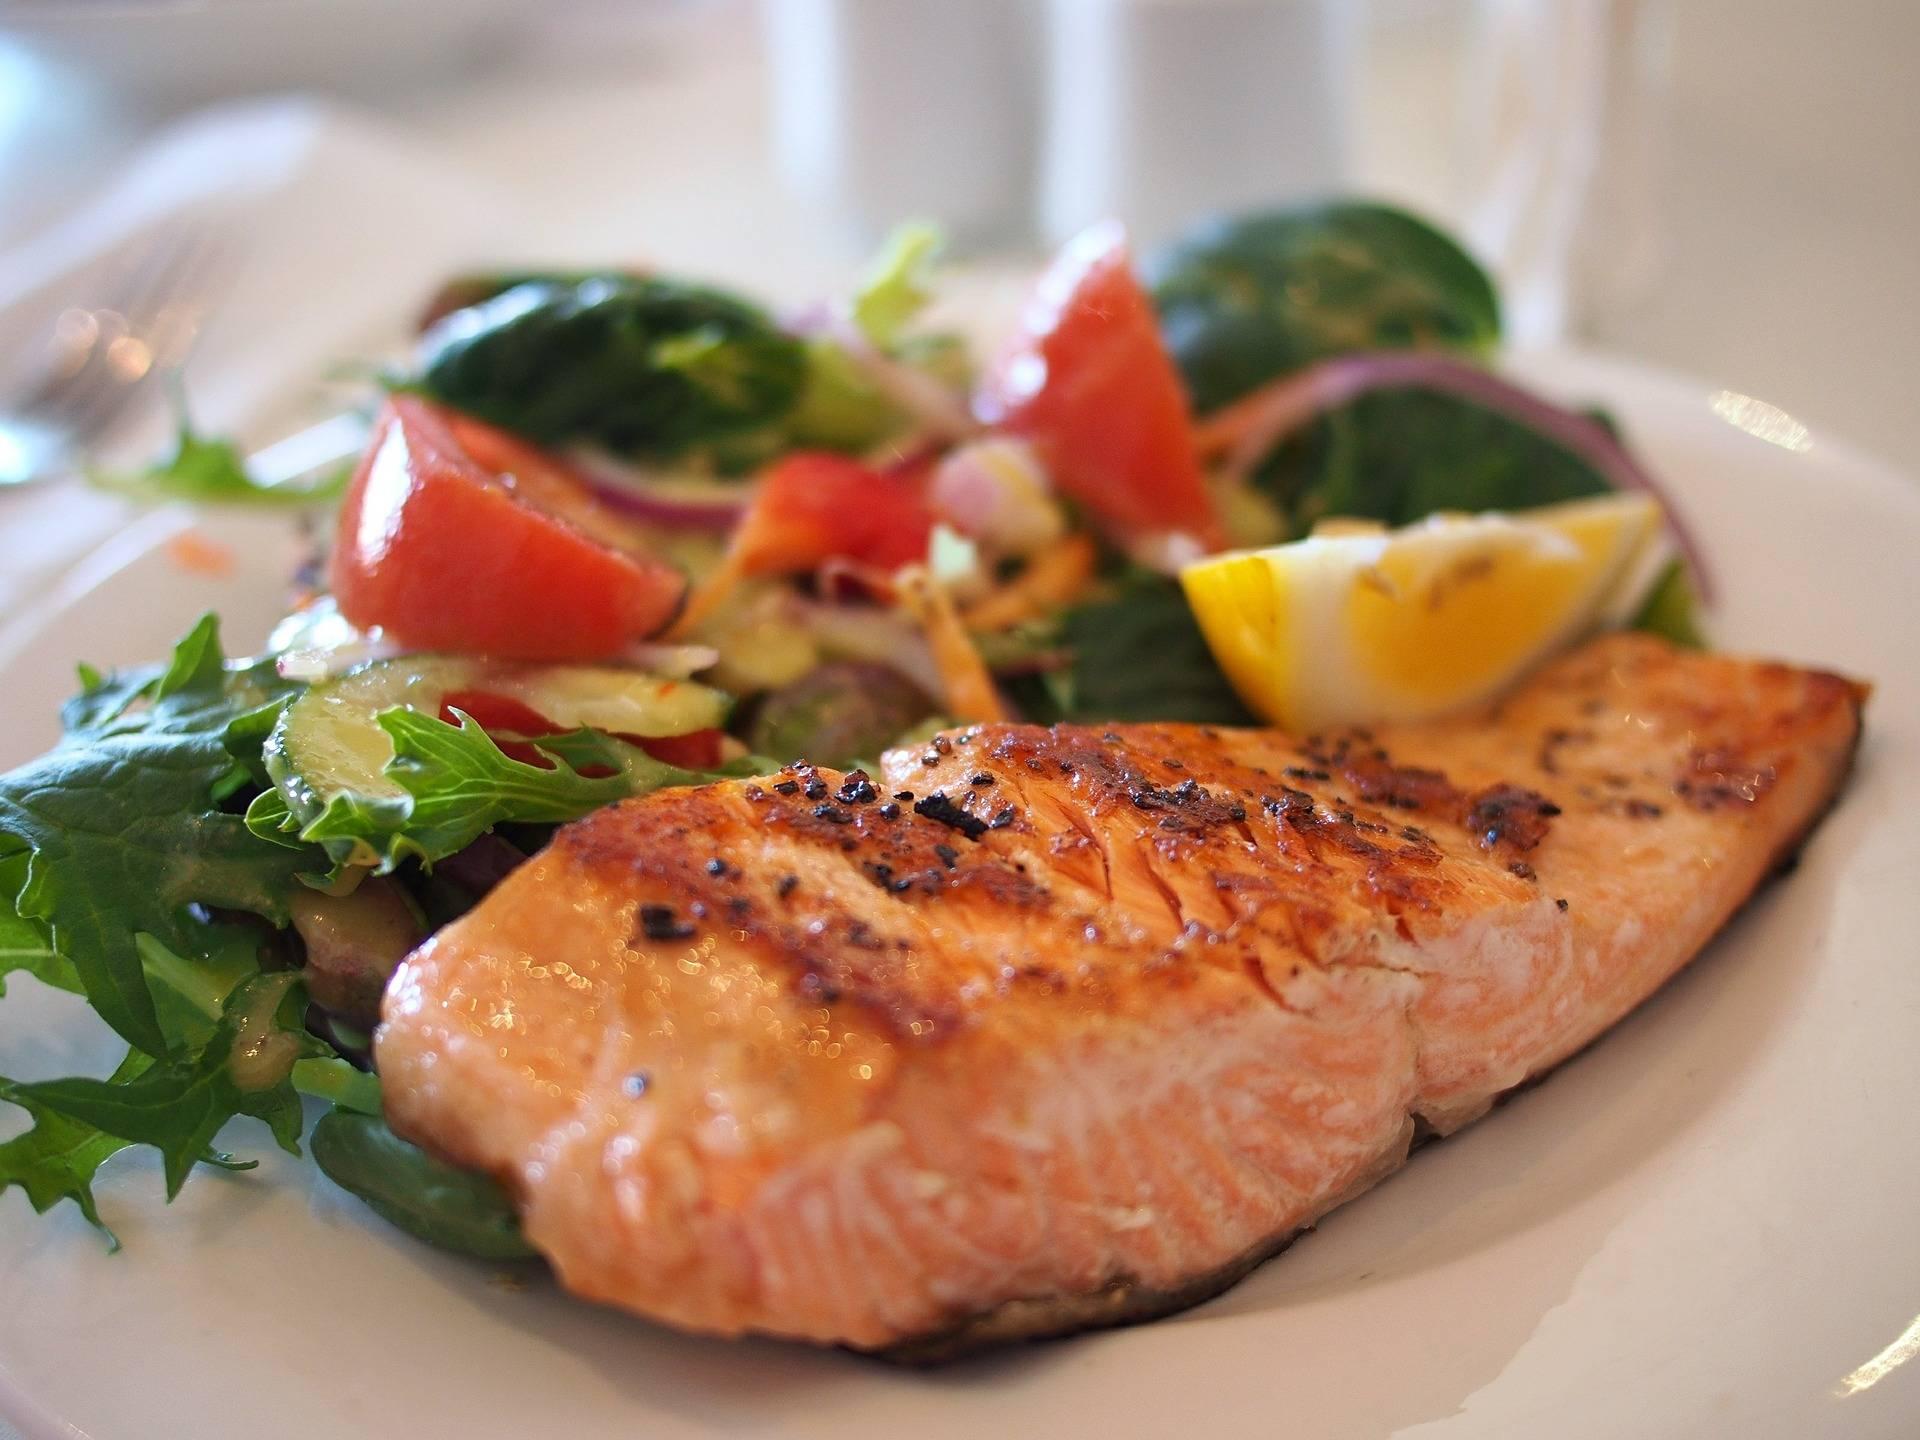 Carne, consigli utili per ricette ok!